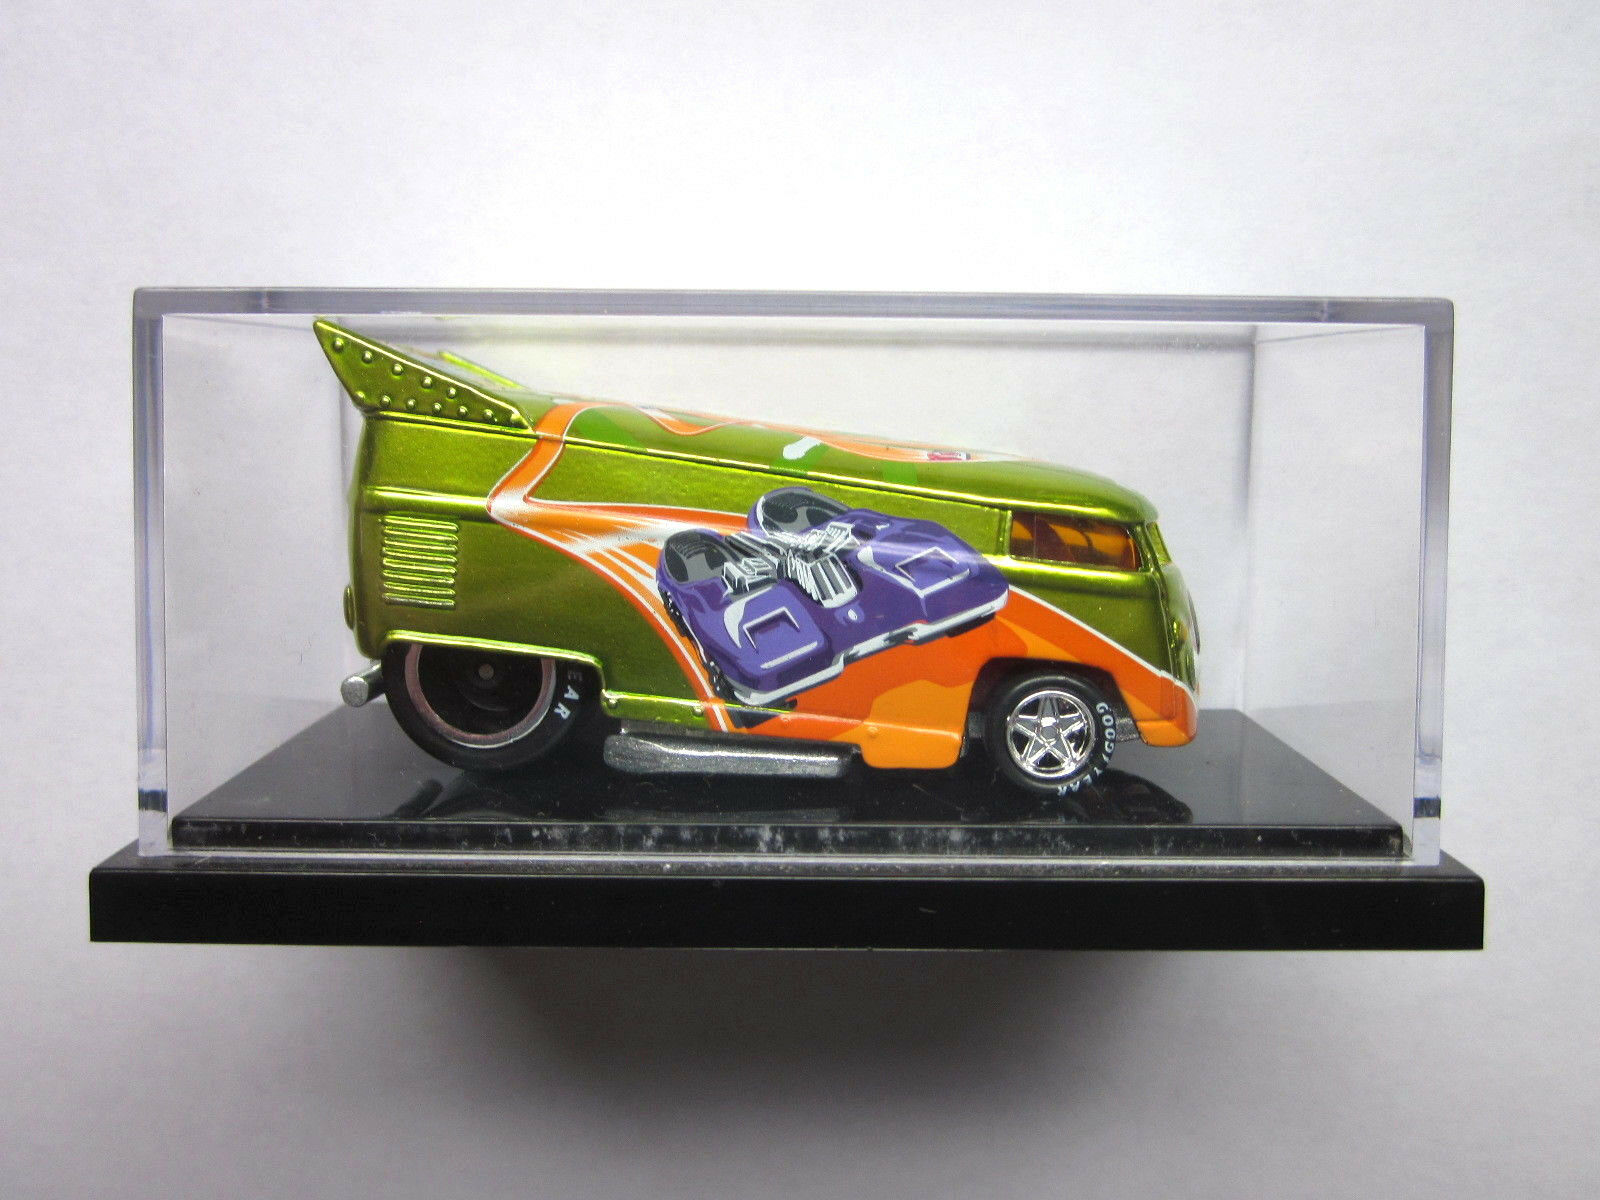 HOT WHEELS LIBERTY PROMOTIONS - 2011 SUMMER SMASH VW DRAG BUS - 384 of 1250